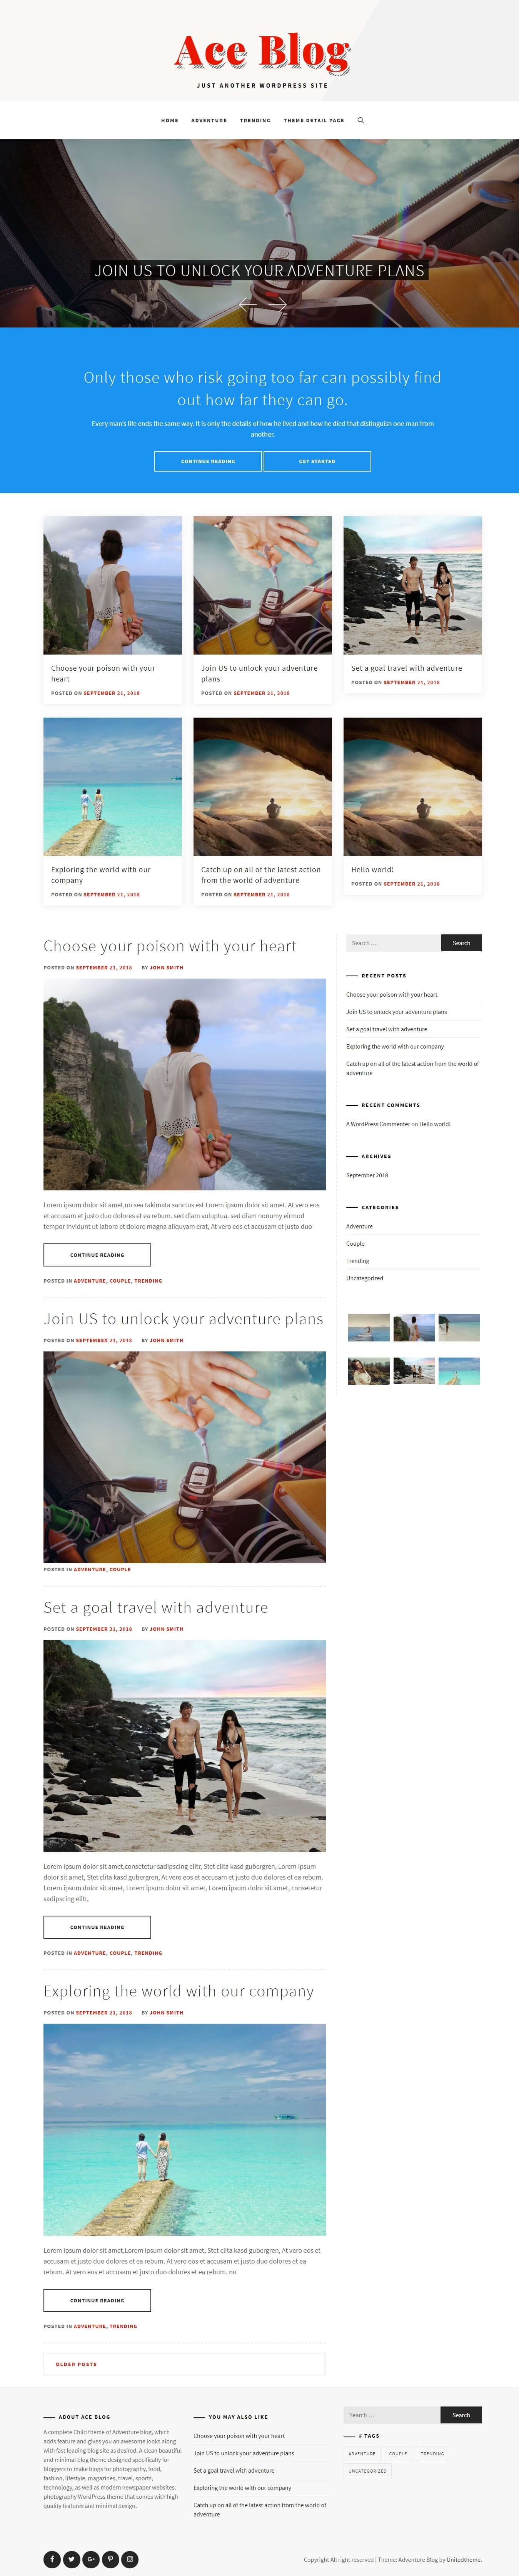 Ace Blog